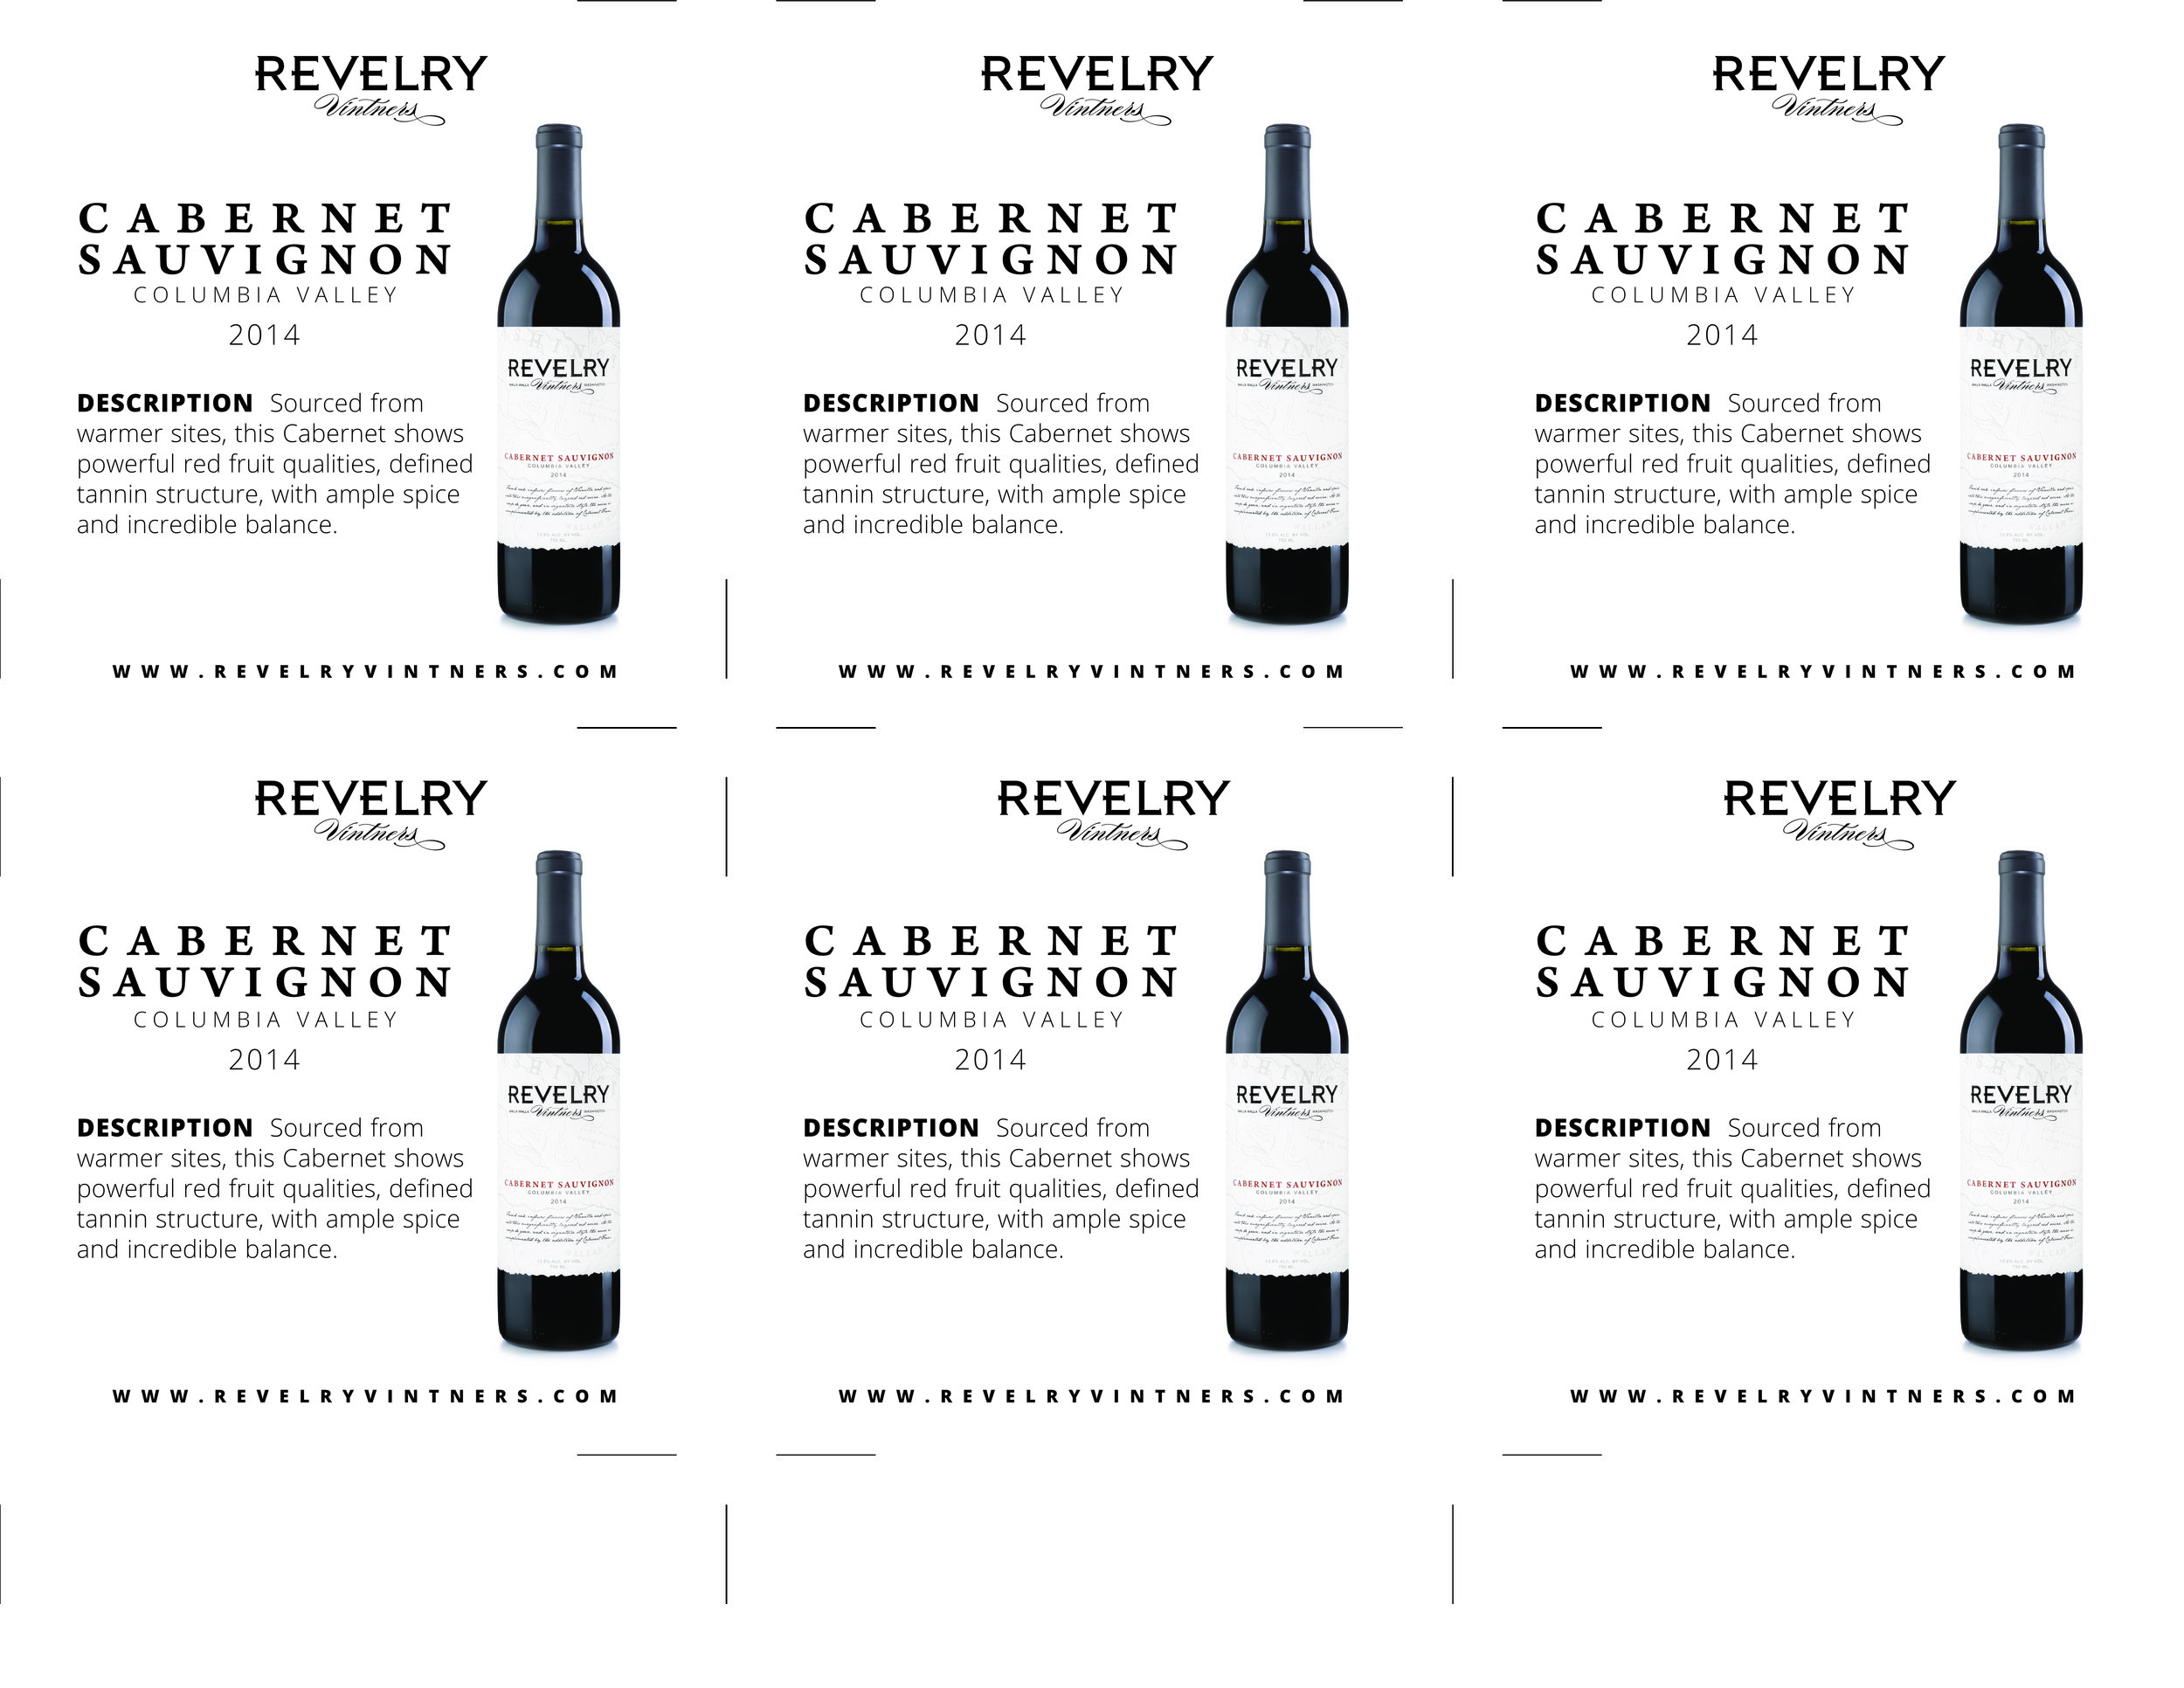 2014 CV CAB SAUV Shelf Talker 3.66SQ.jpg